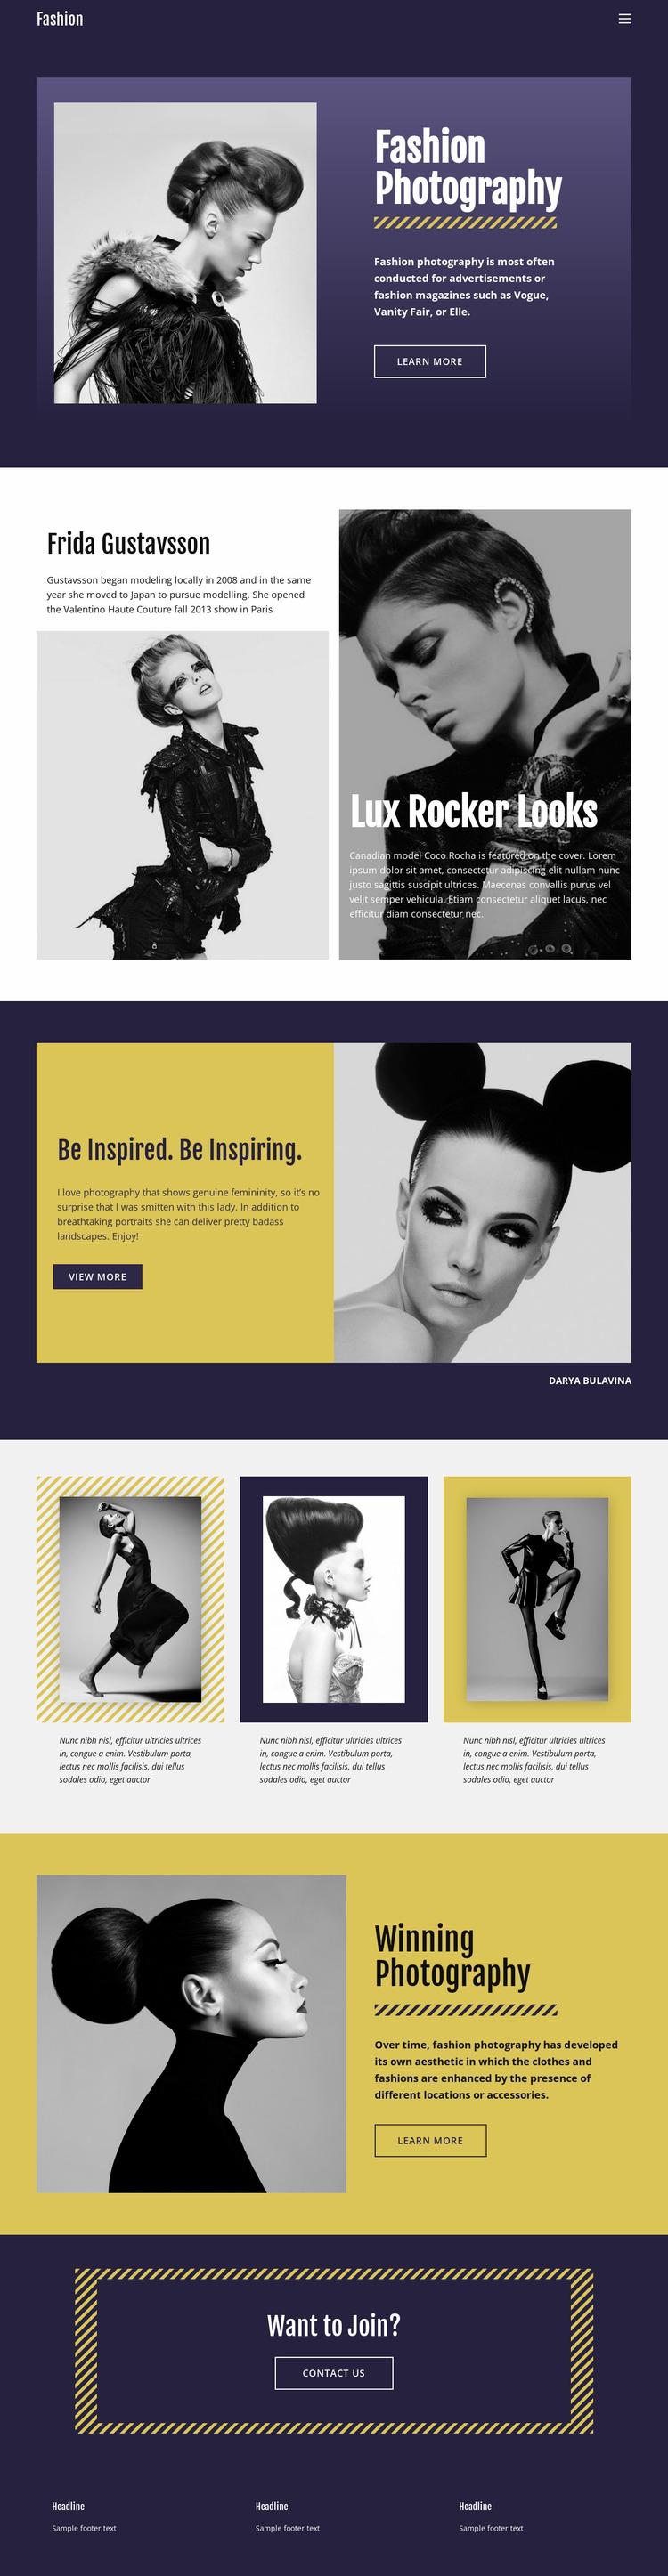 Fashion Photography Classic Style Website Mockup